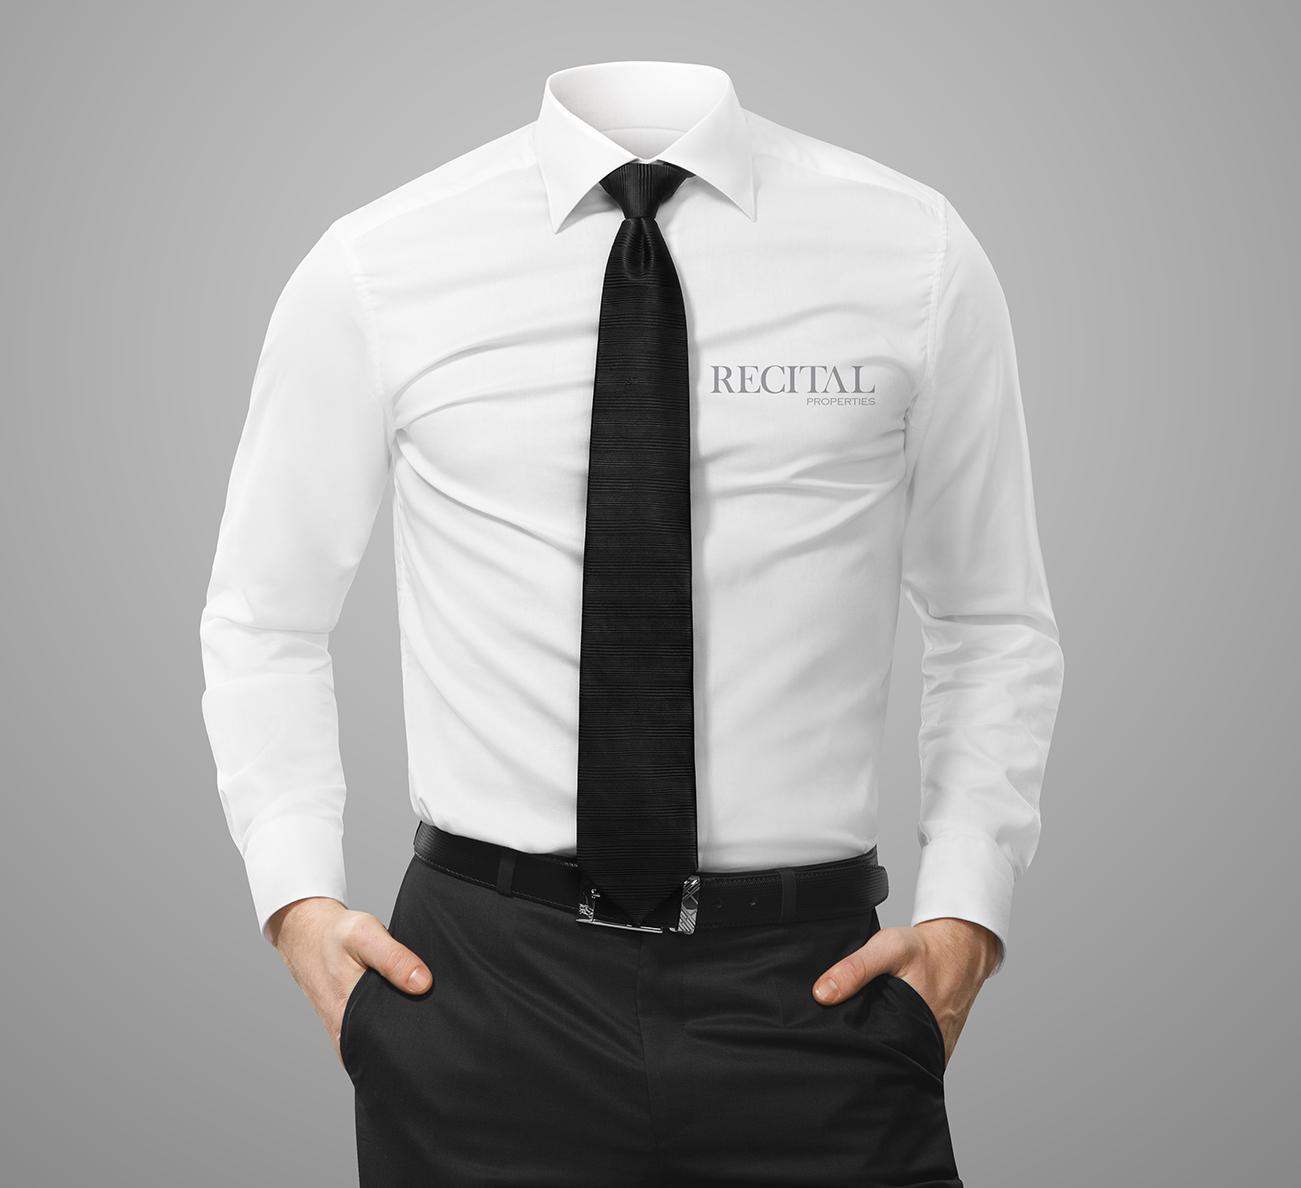 Recital-shirt